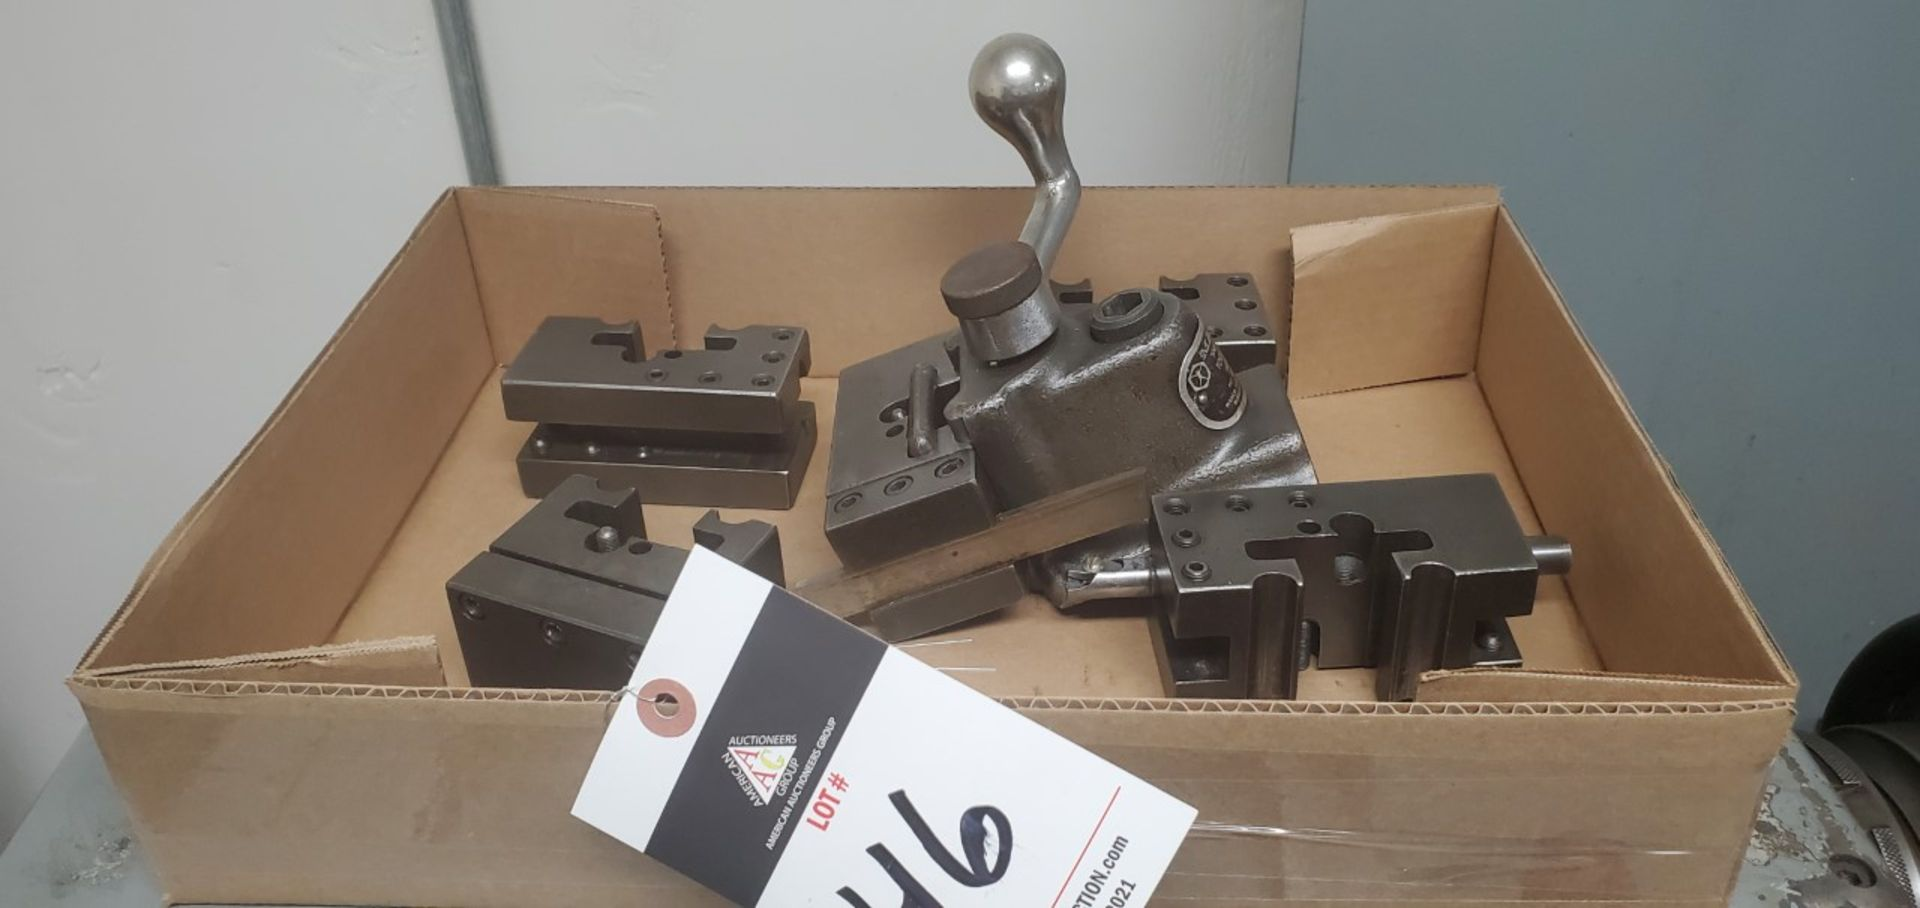 Lot 46 - Manco Tool Post and Tool Holders